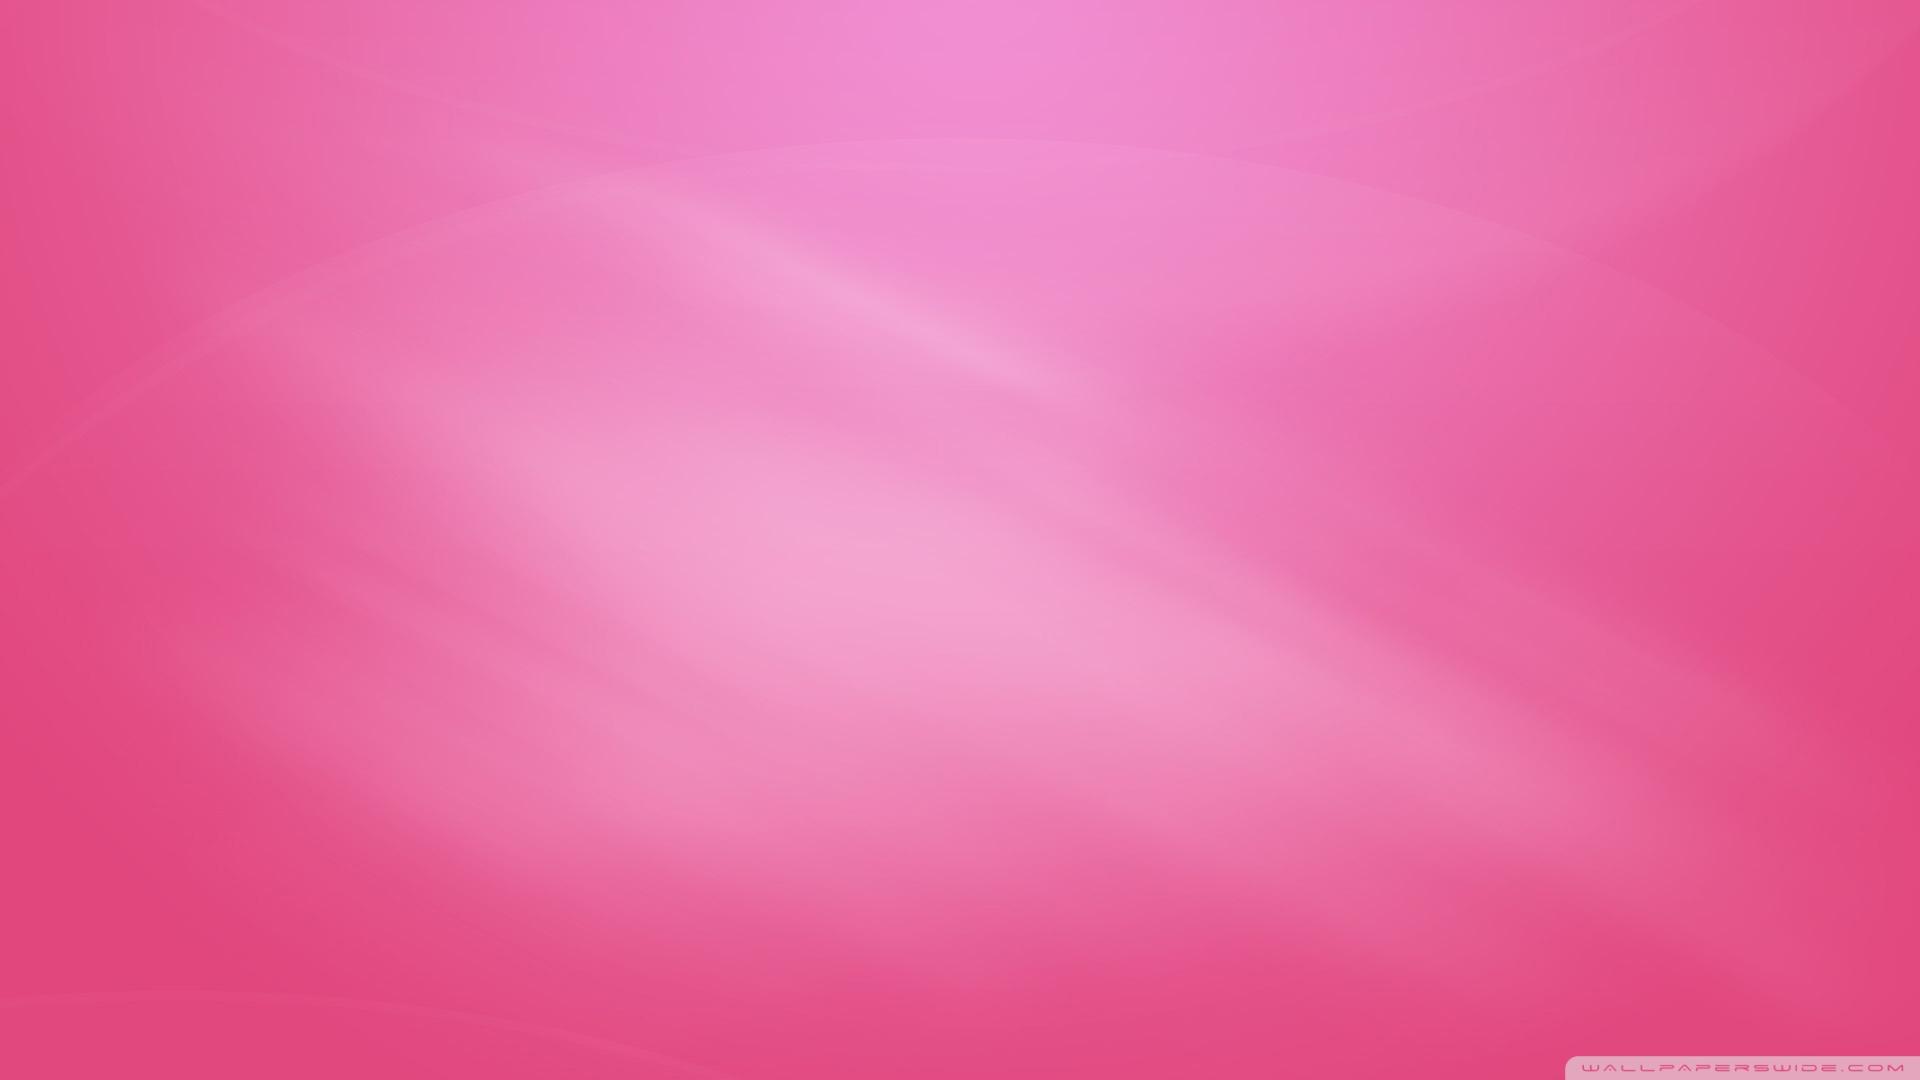 Pink Wallpaper Hd Live Wallpaper Hd Desktop Wallpapers 1920x1080